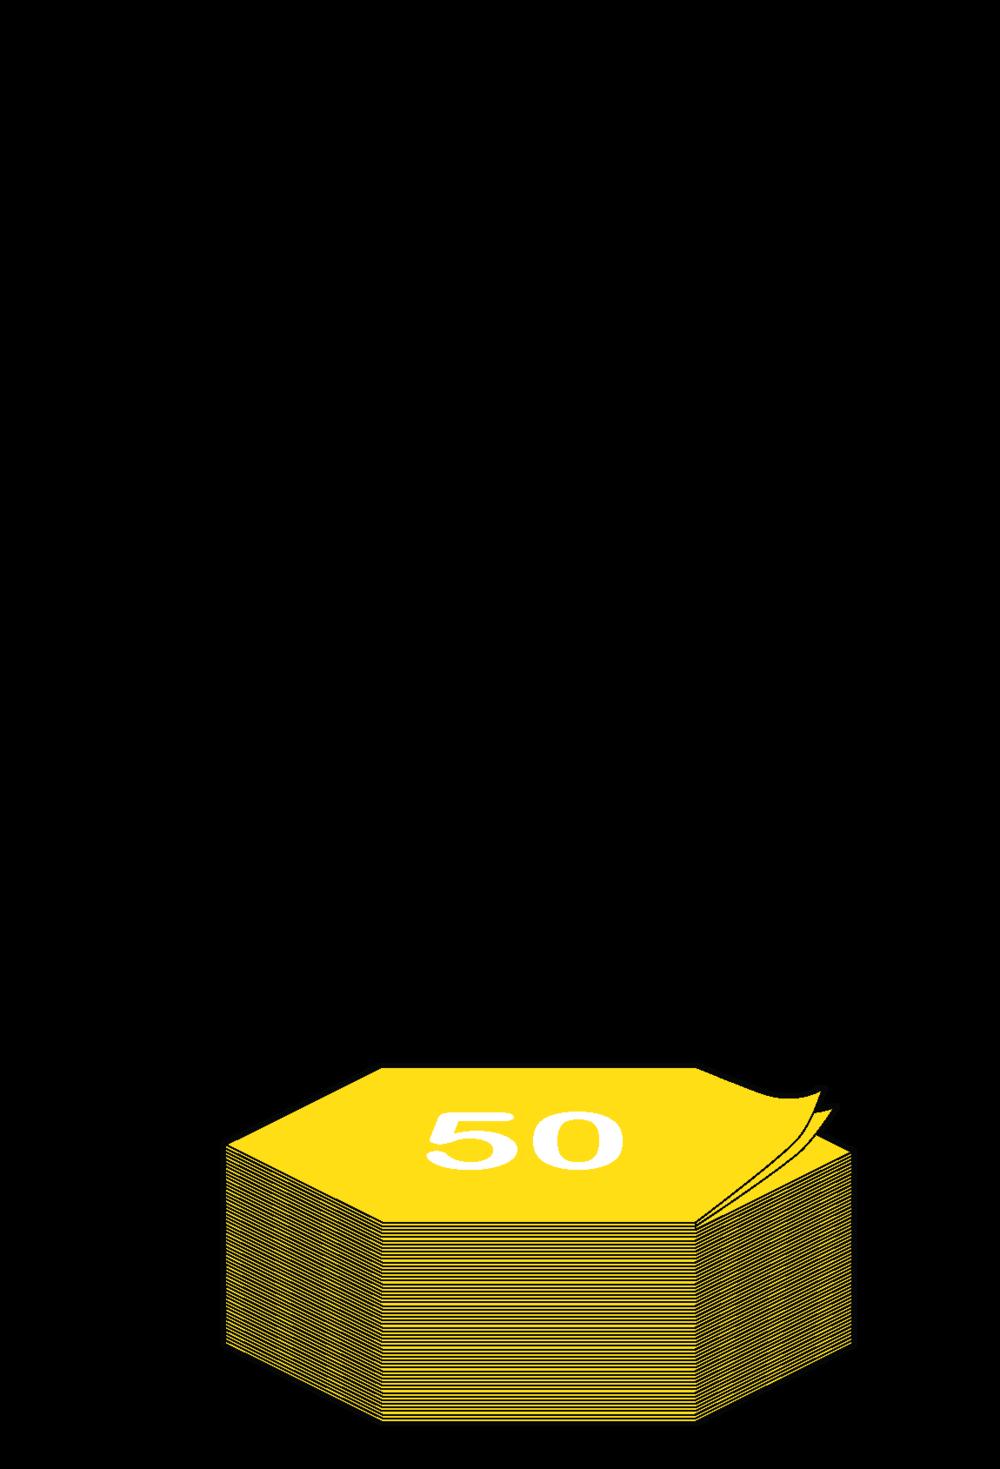 50-post its